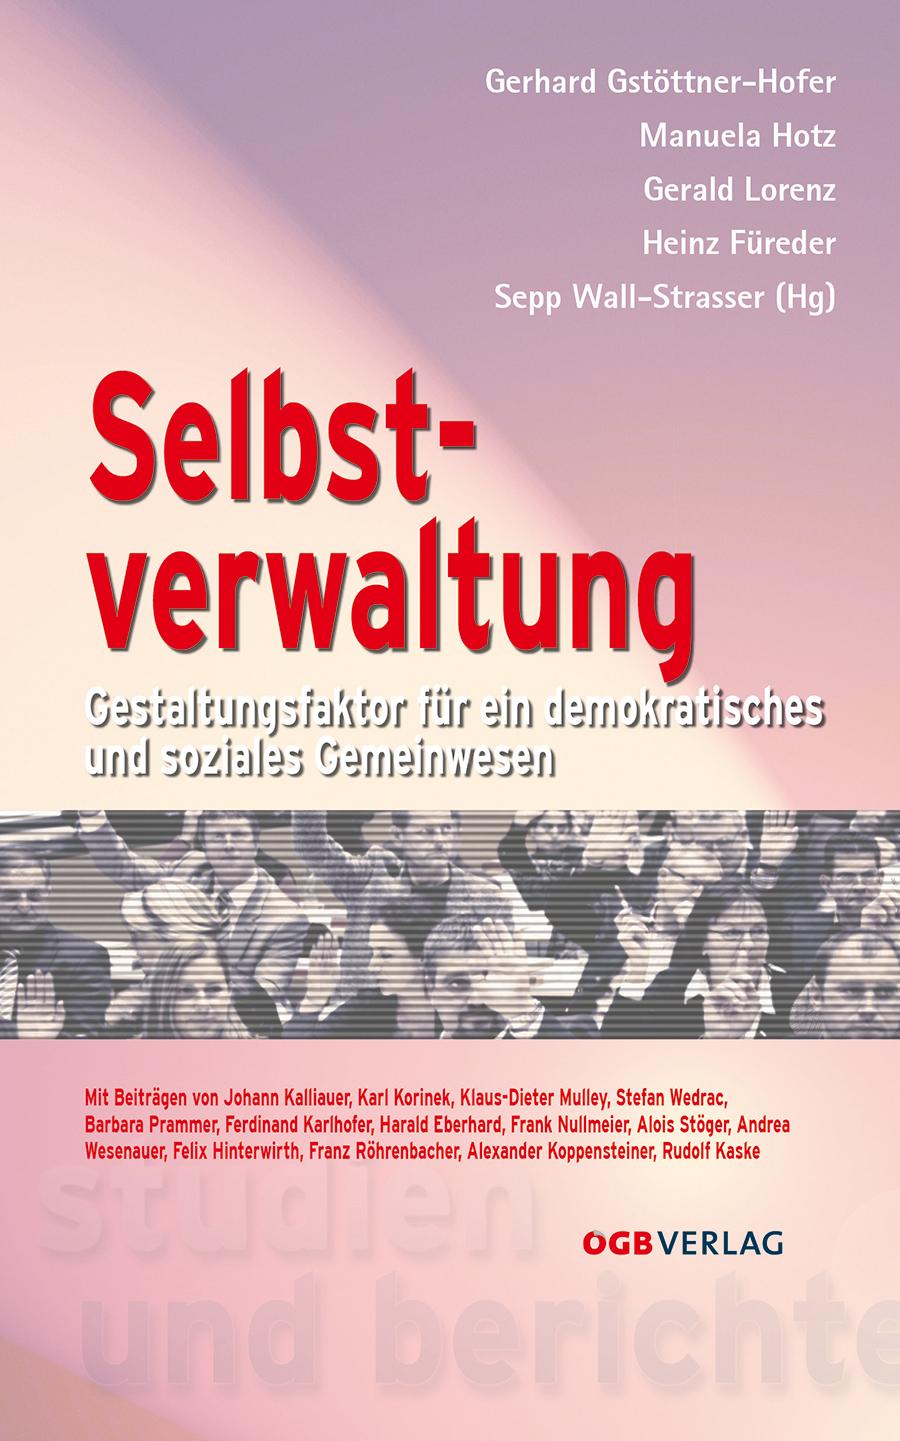 Selbstverwaltung Gerhard Gstöttner-Hofer